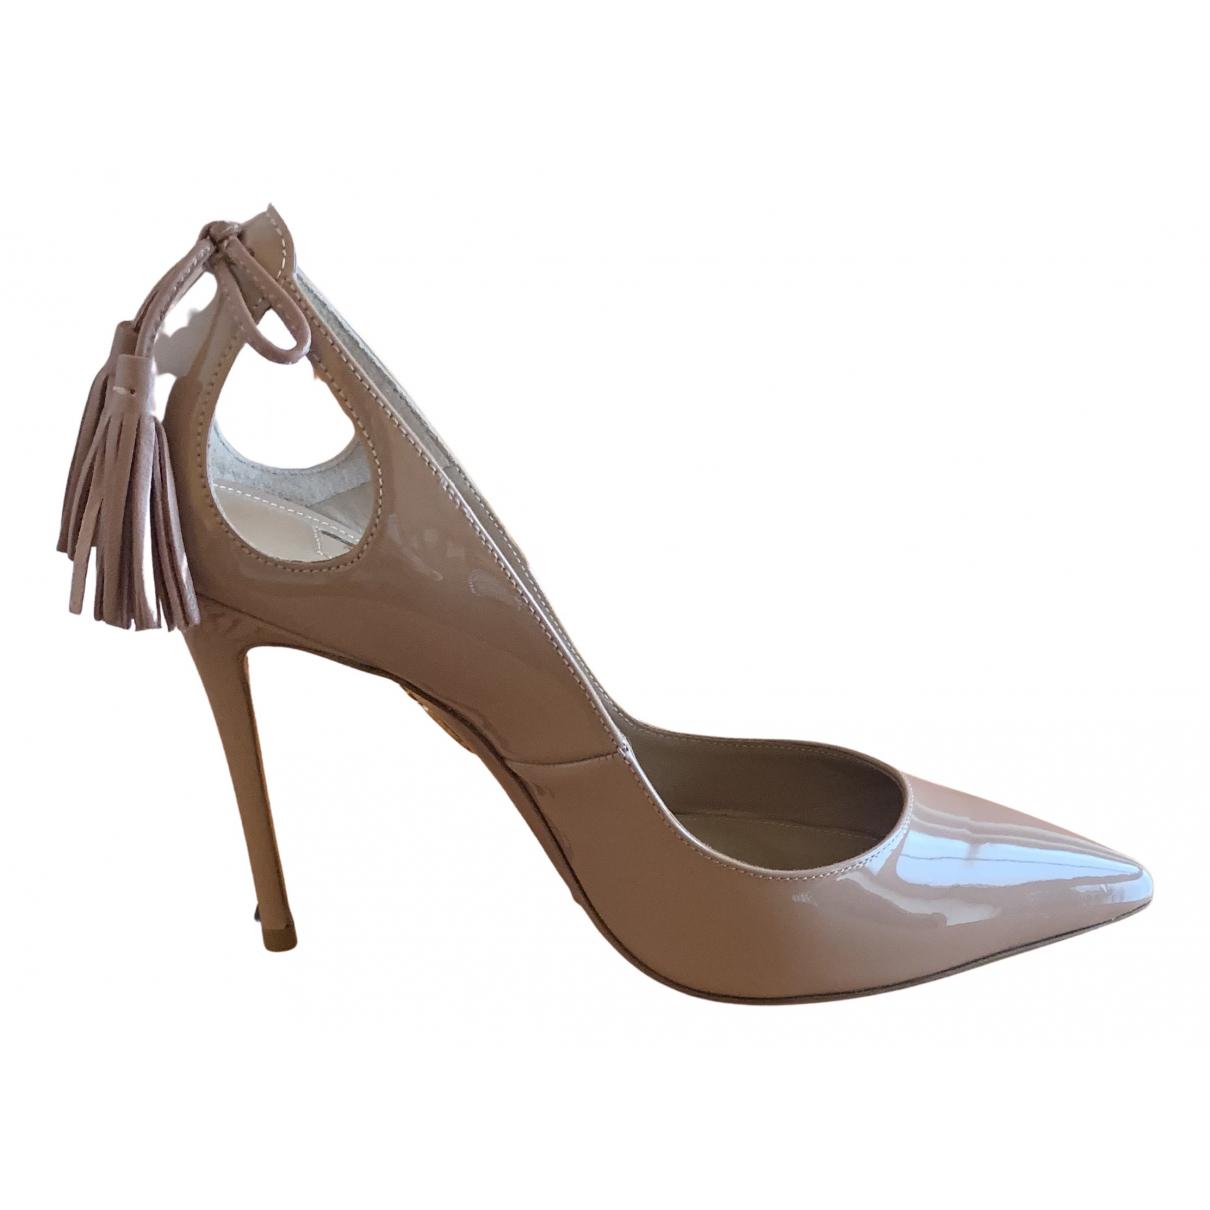 Aquazzura - Escarpins   pour femme en cuir verni - beige